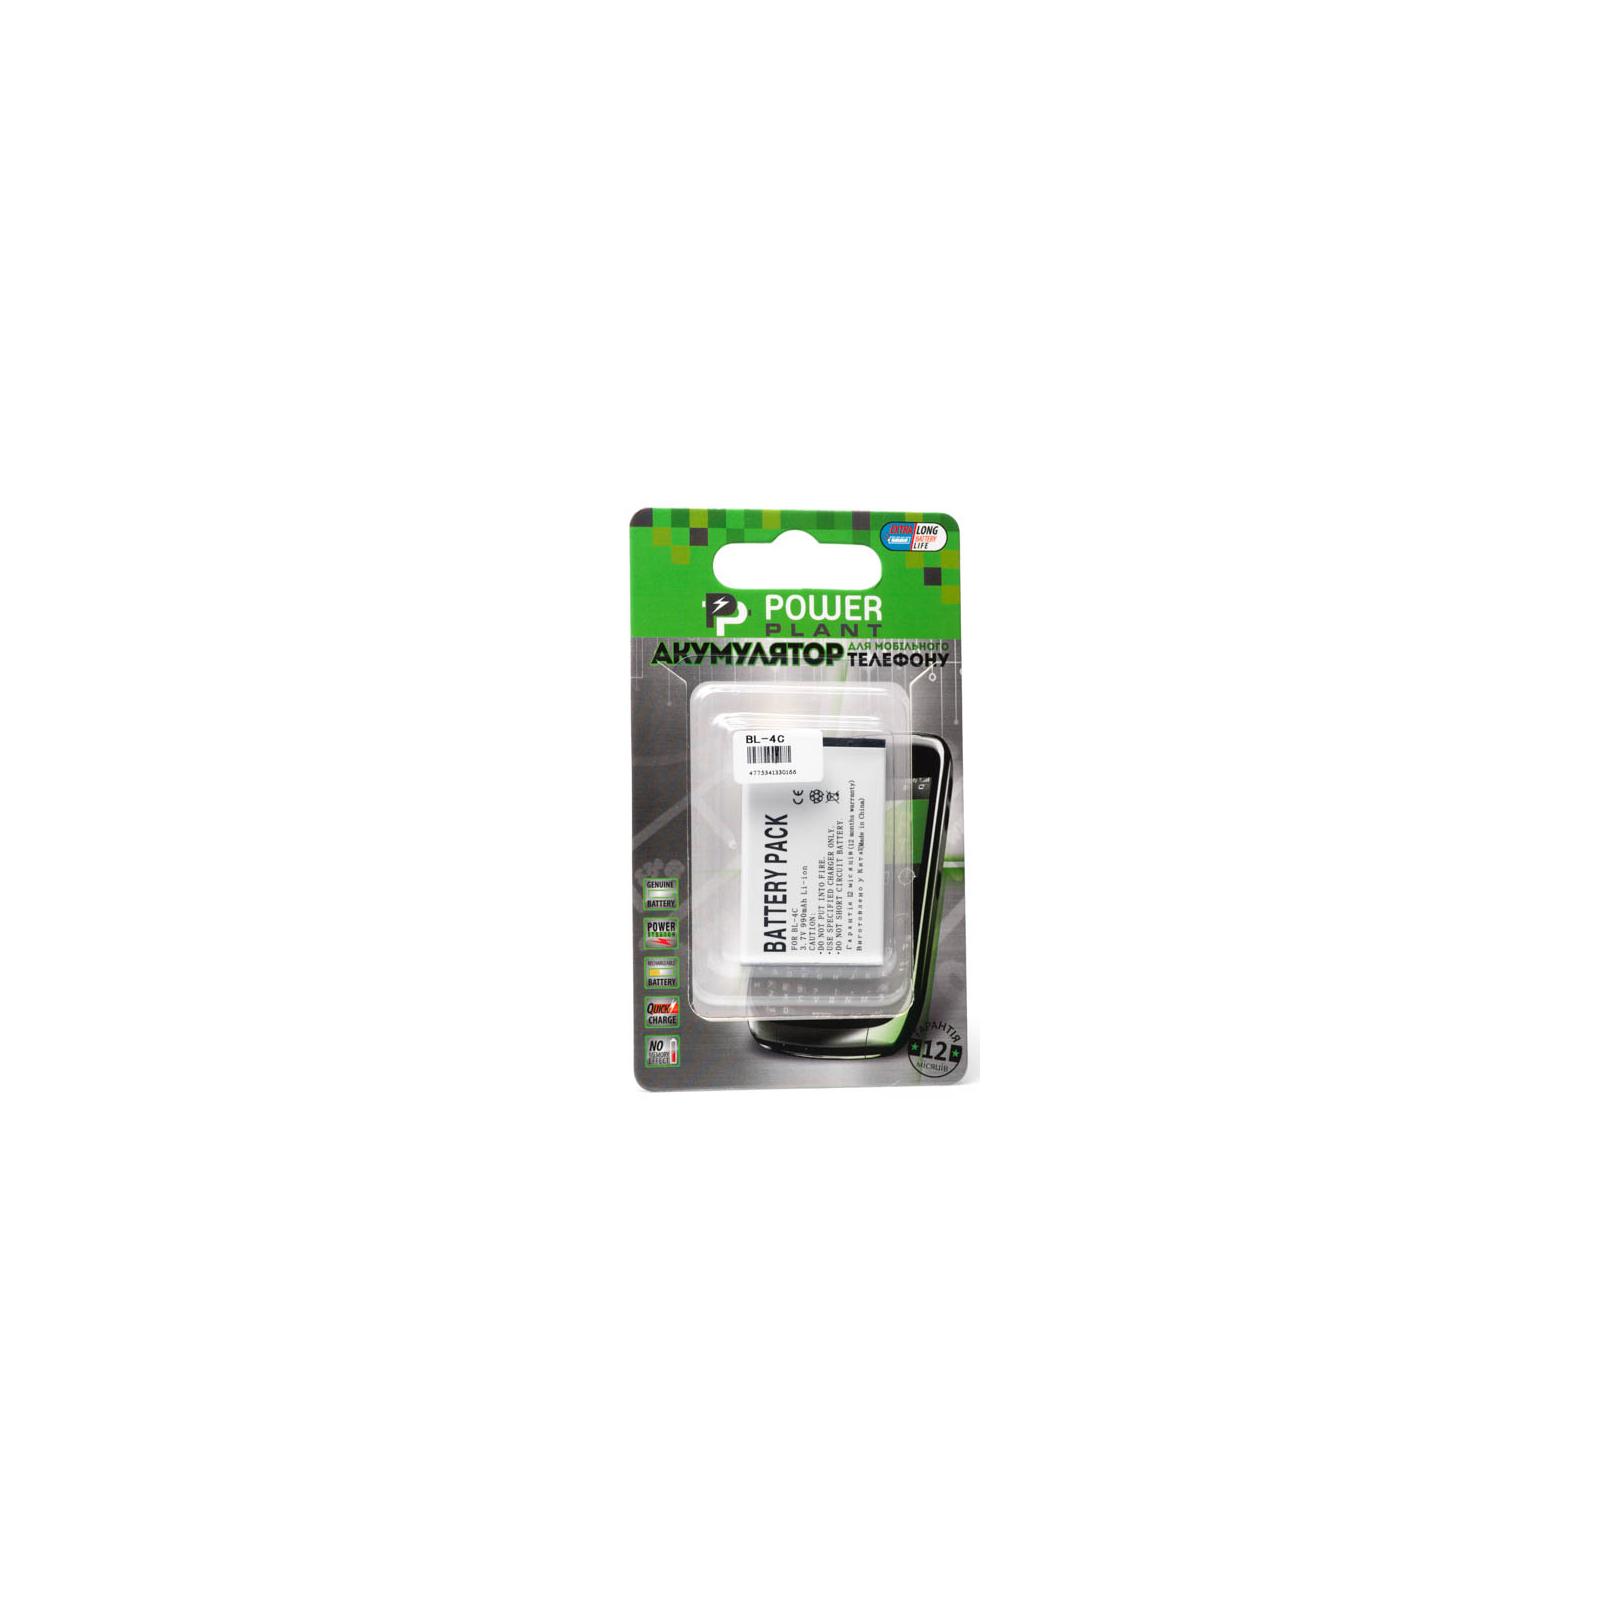 Аккумуляторная батарея PowerPlant Nokia BL-4C (6230, 6100, 5100) (DV00DV1124) изображение 2